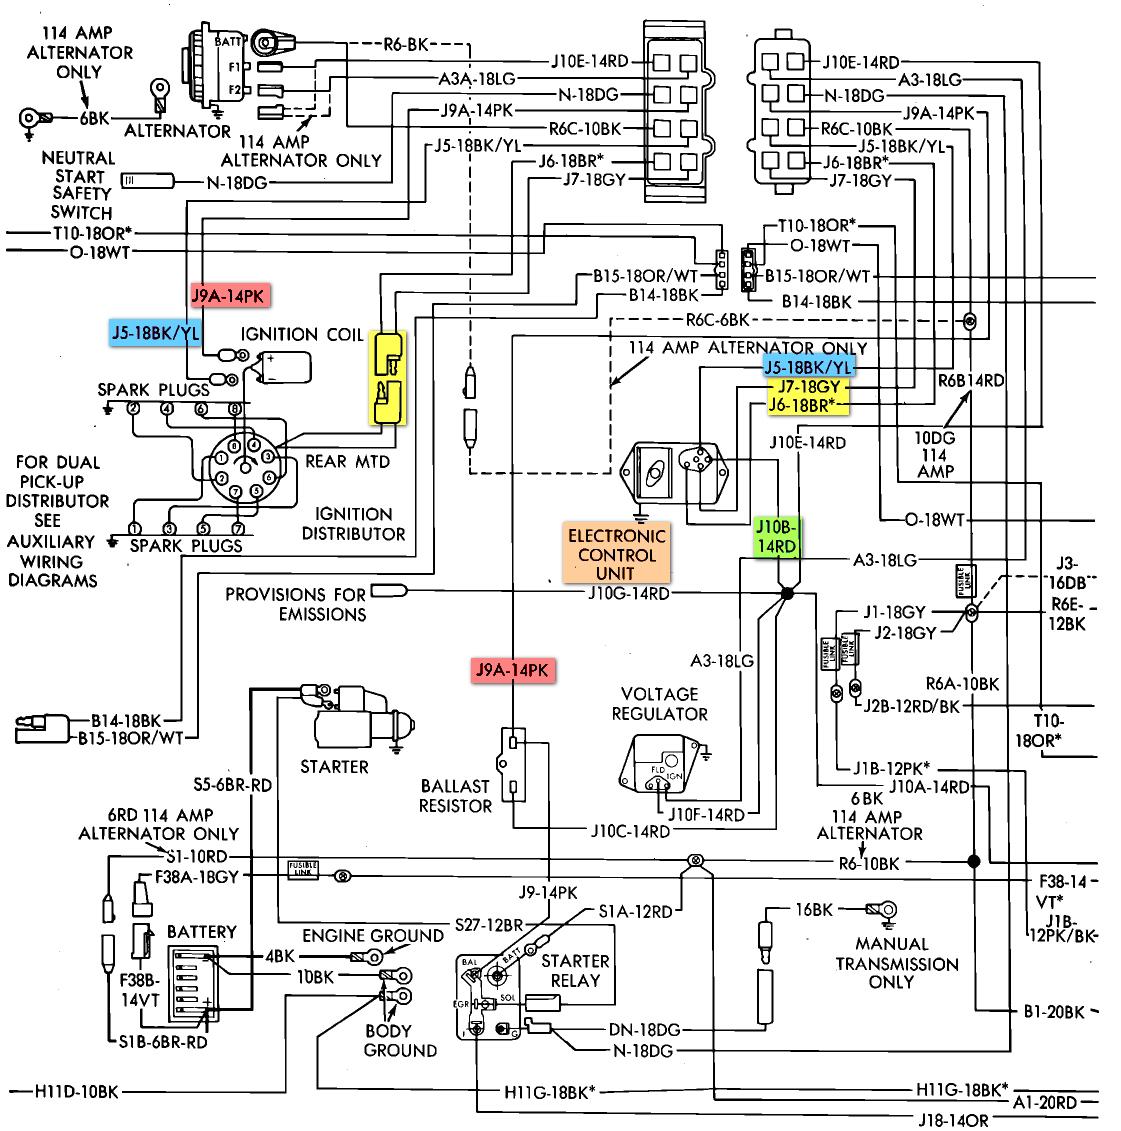 2010 01 02 171810 83 ecu diagram png